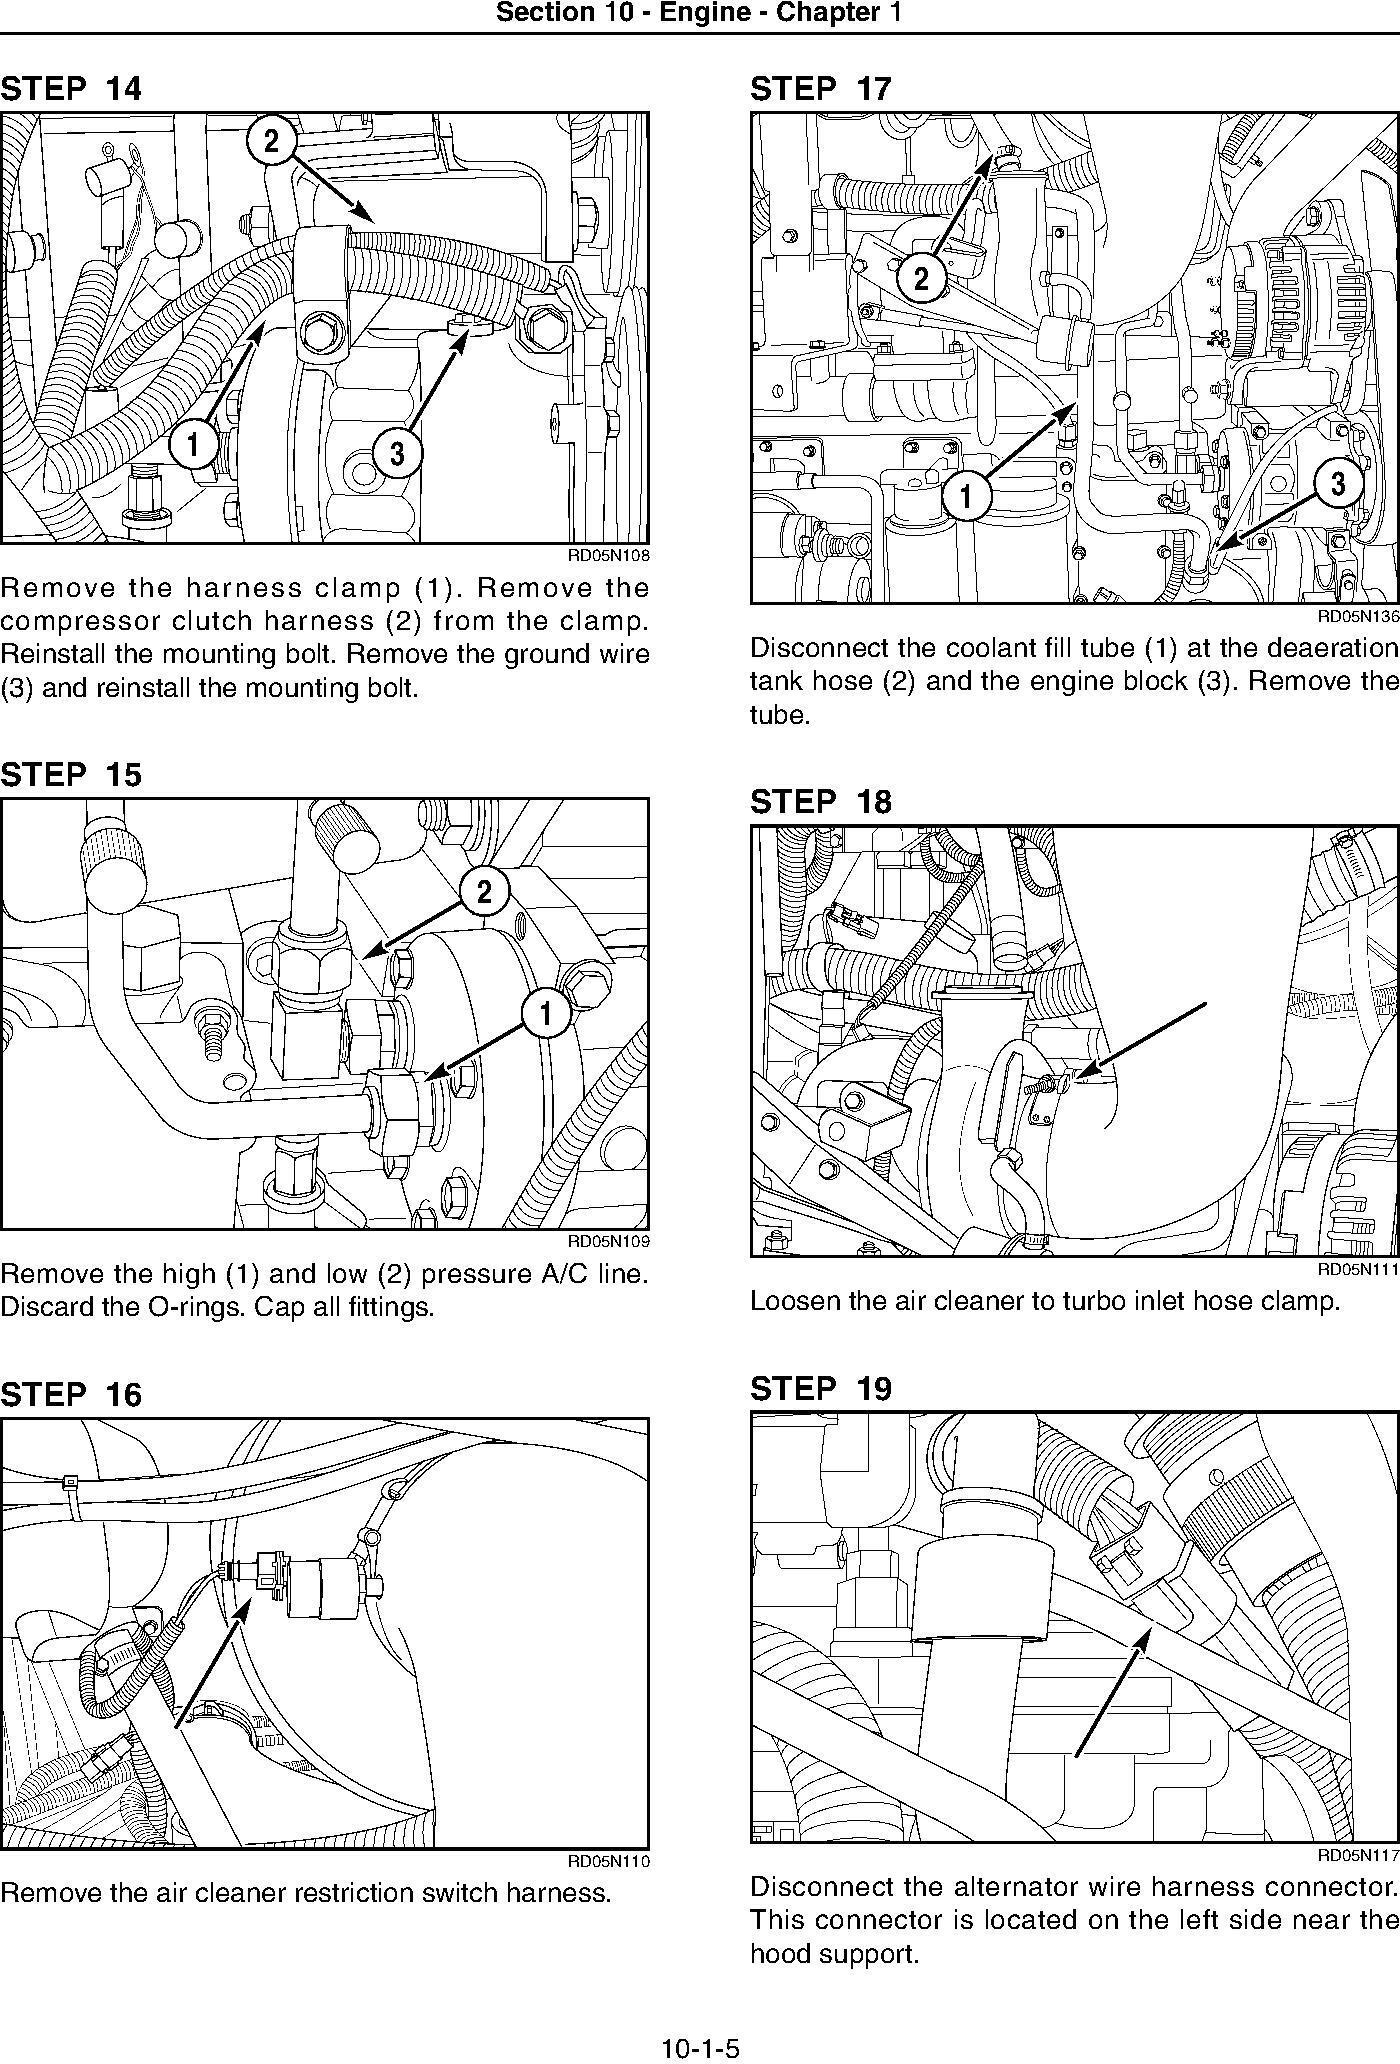 New Holland TG215, TG245, TG275, TG305 Tractor Service Manual - 1